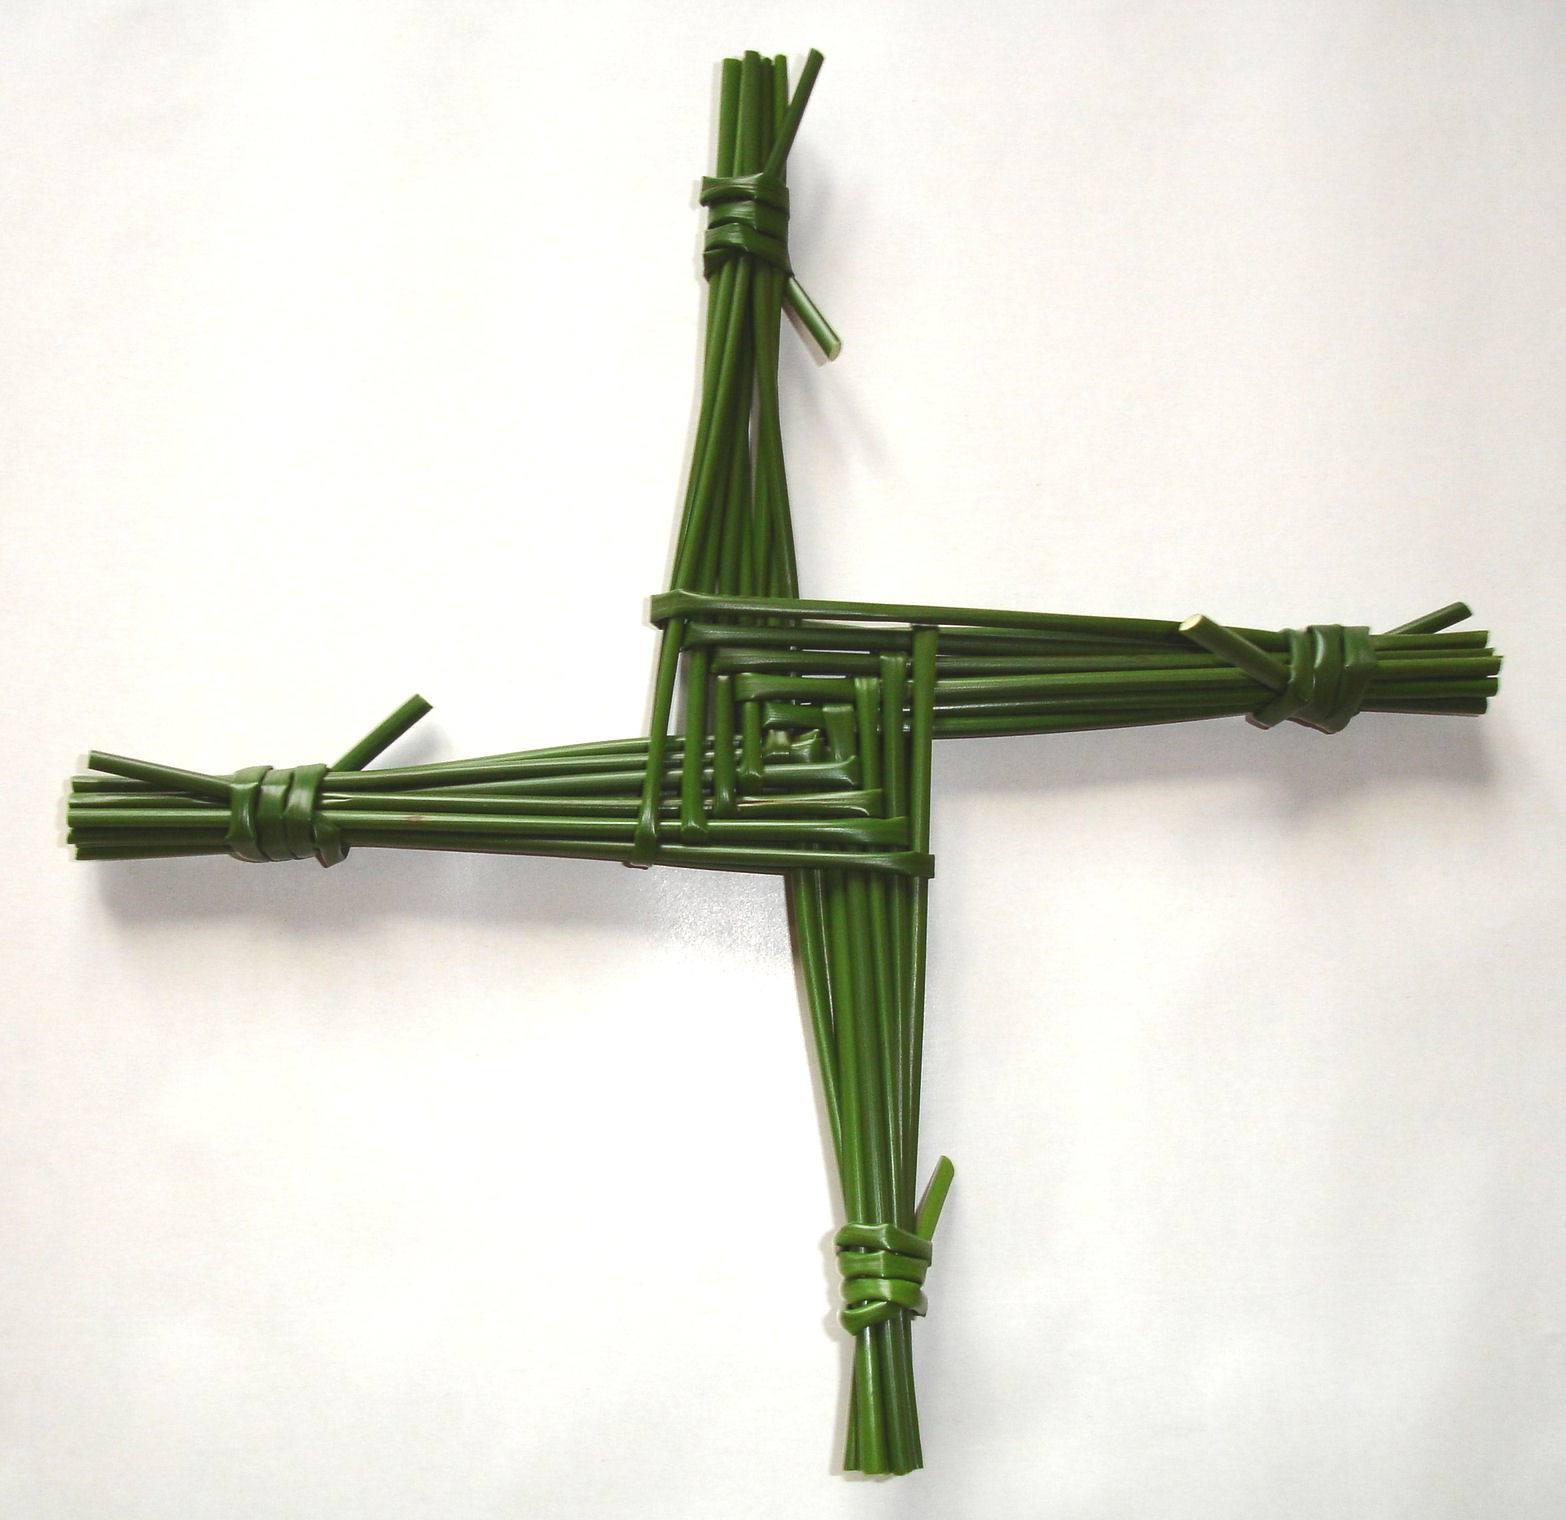 A handmade Brigid's cross against white background.